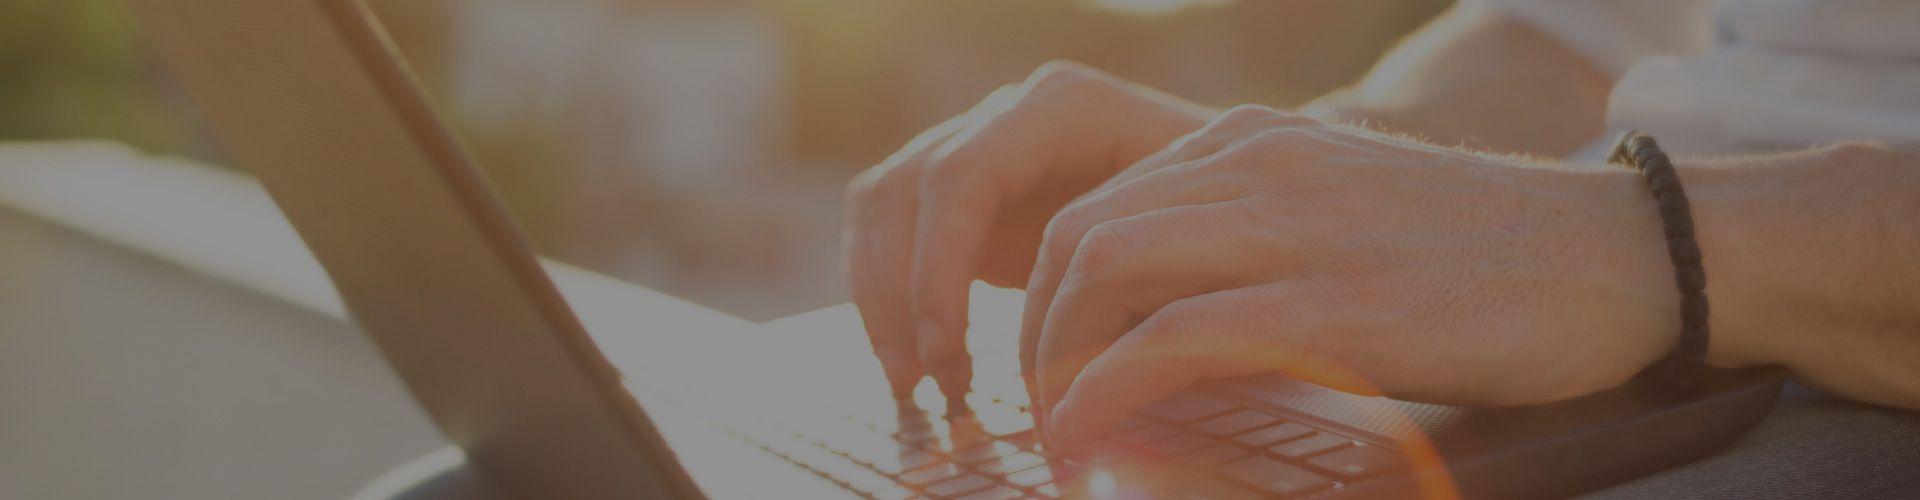 typinghands